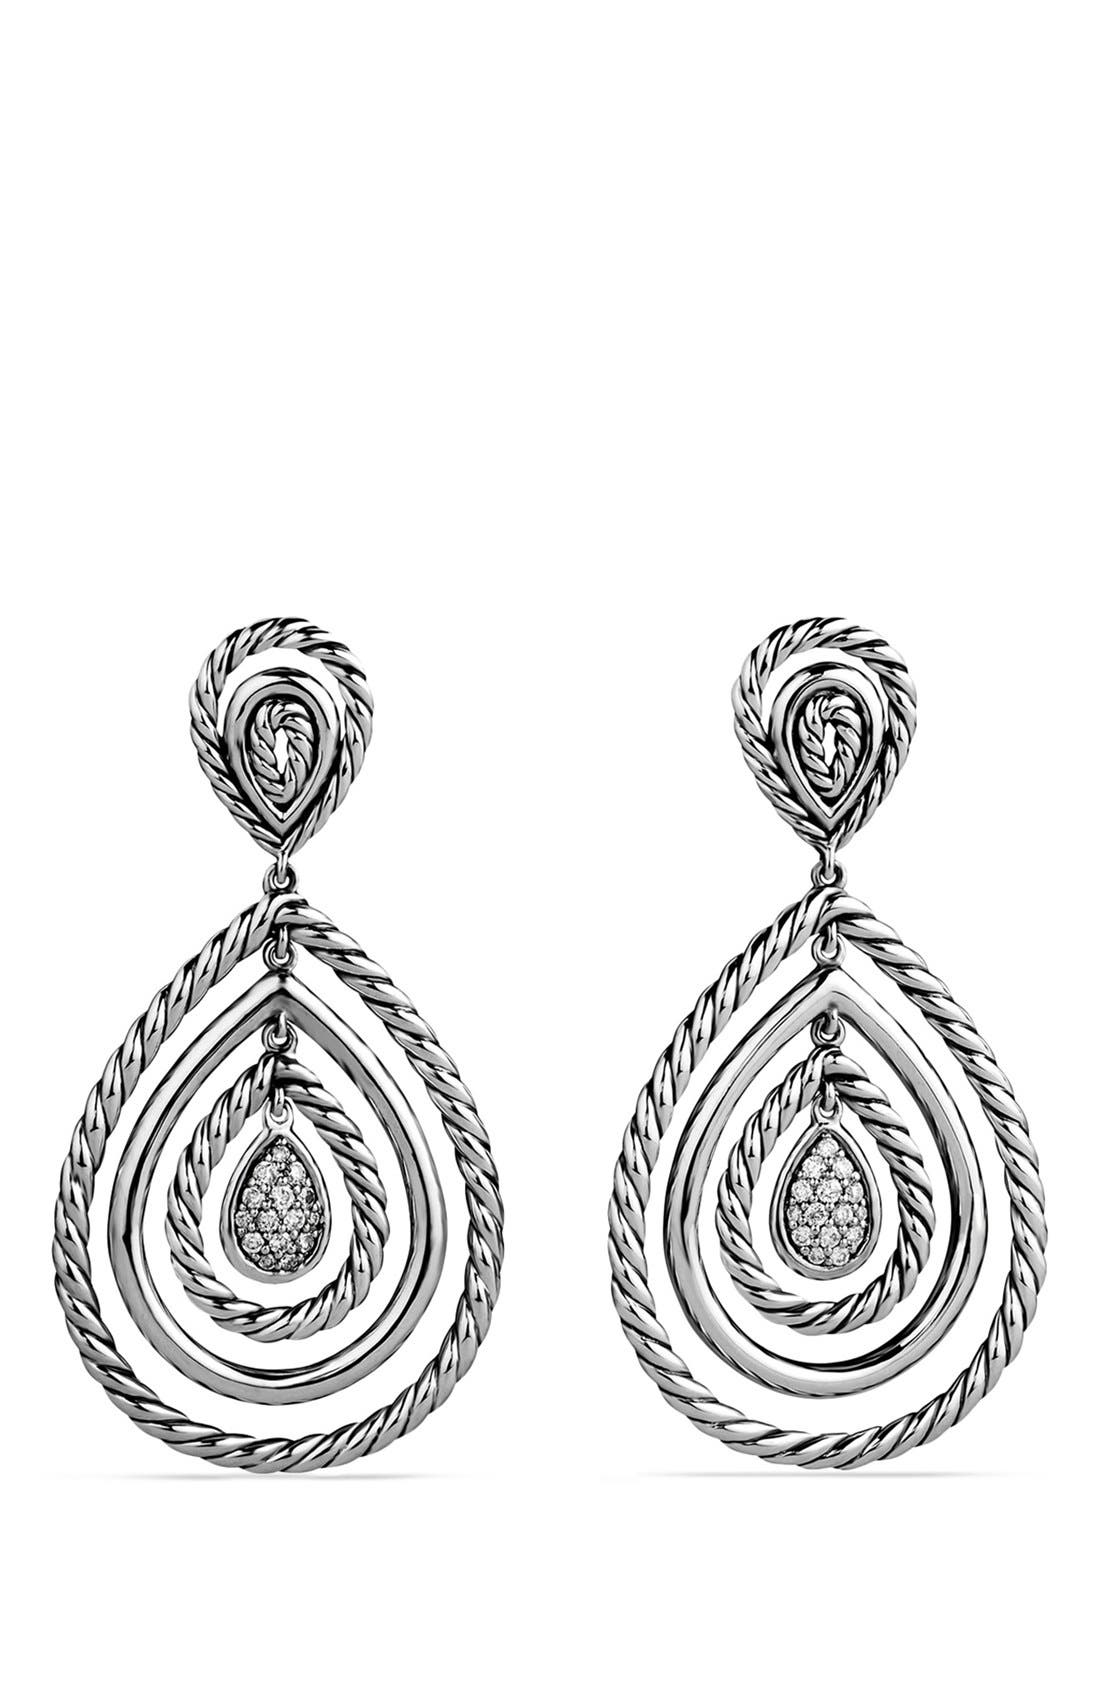 DAVID YURMAN Cable Classics Teardrop Earrings with Diamonds